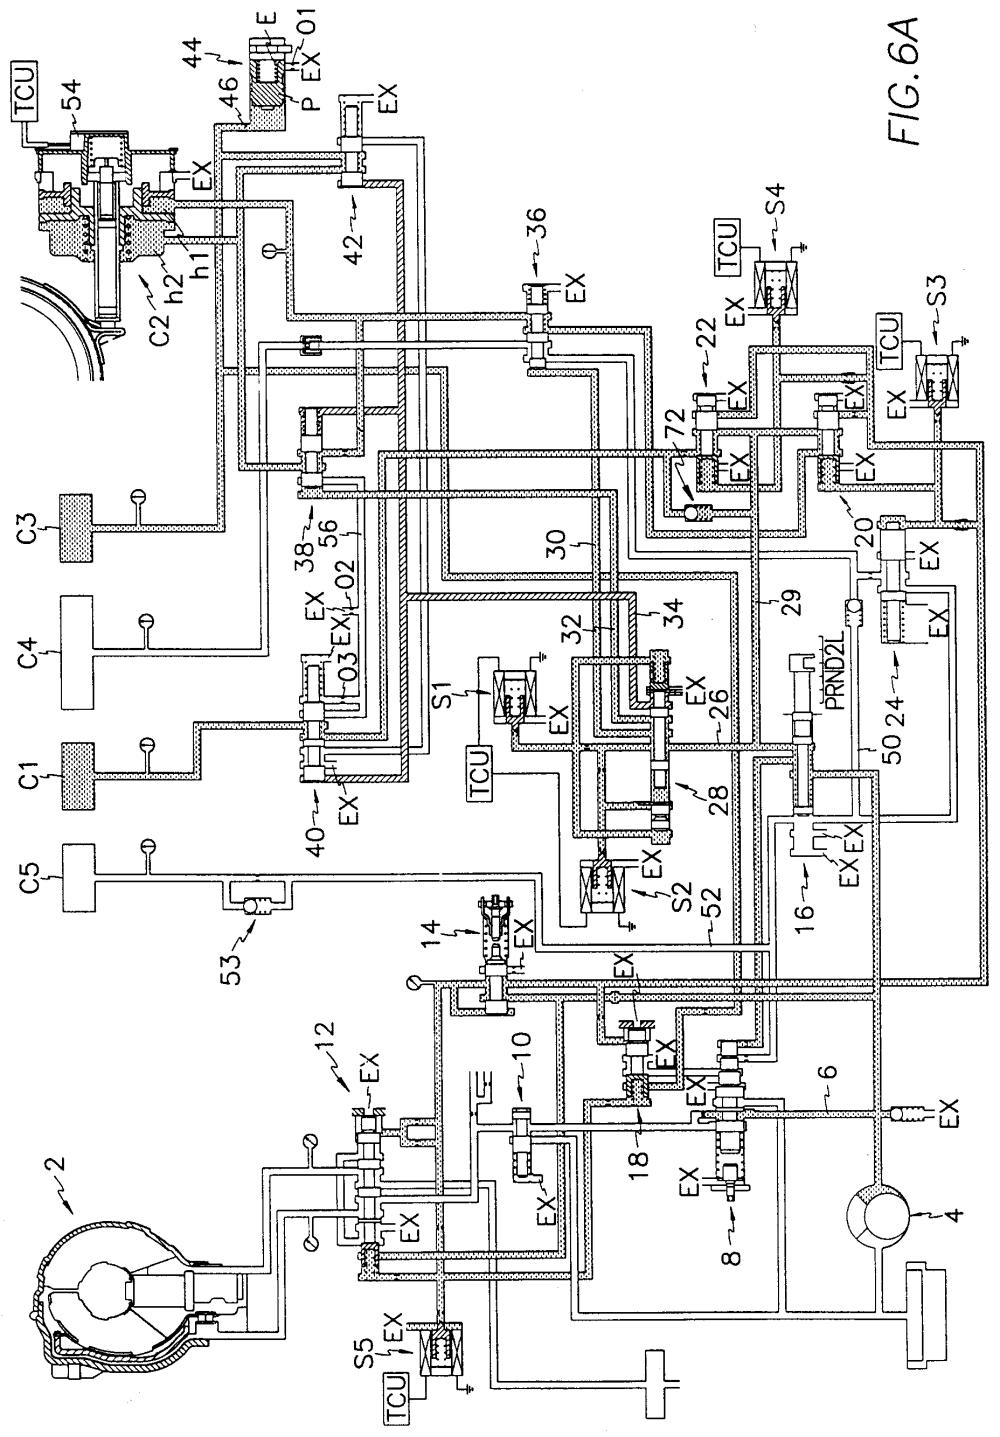 medium resolution of international s1900 wiring diagram